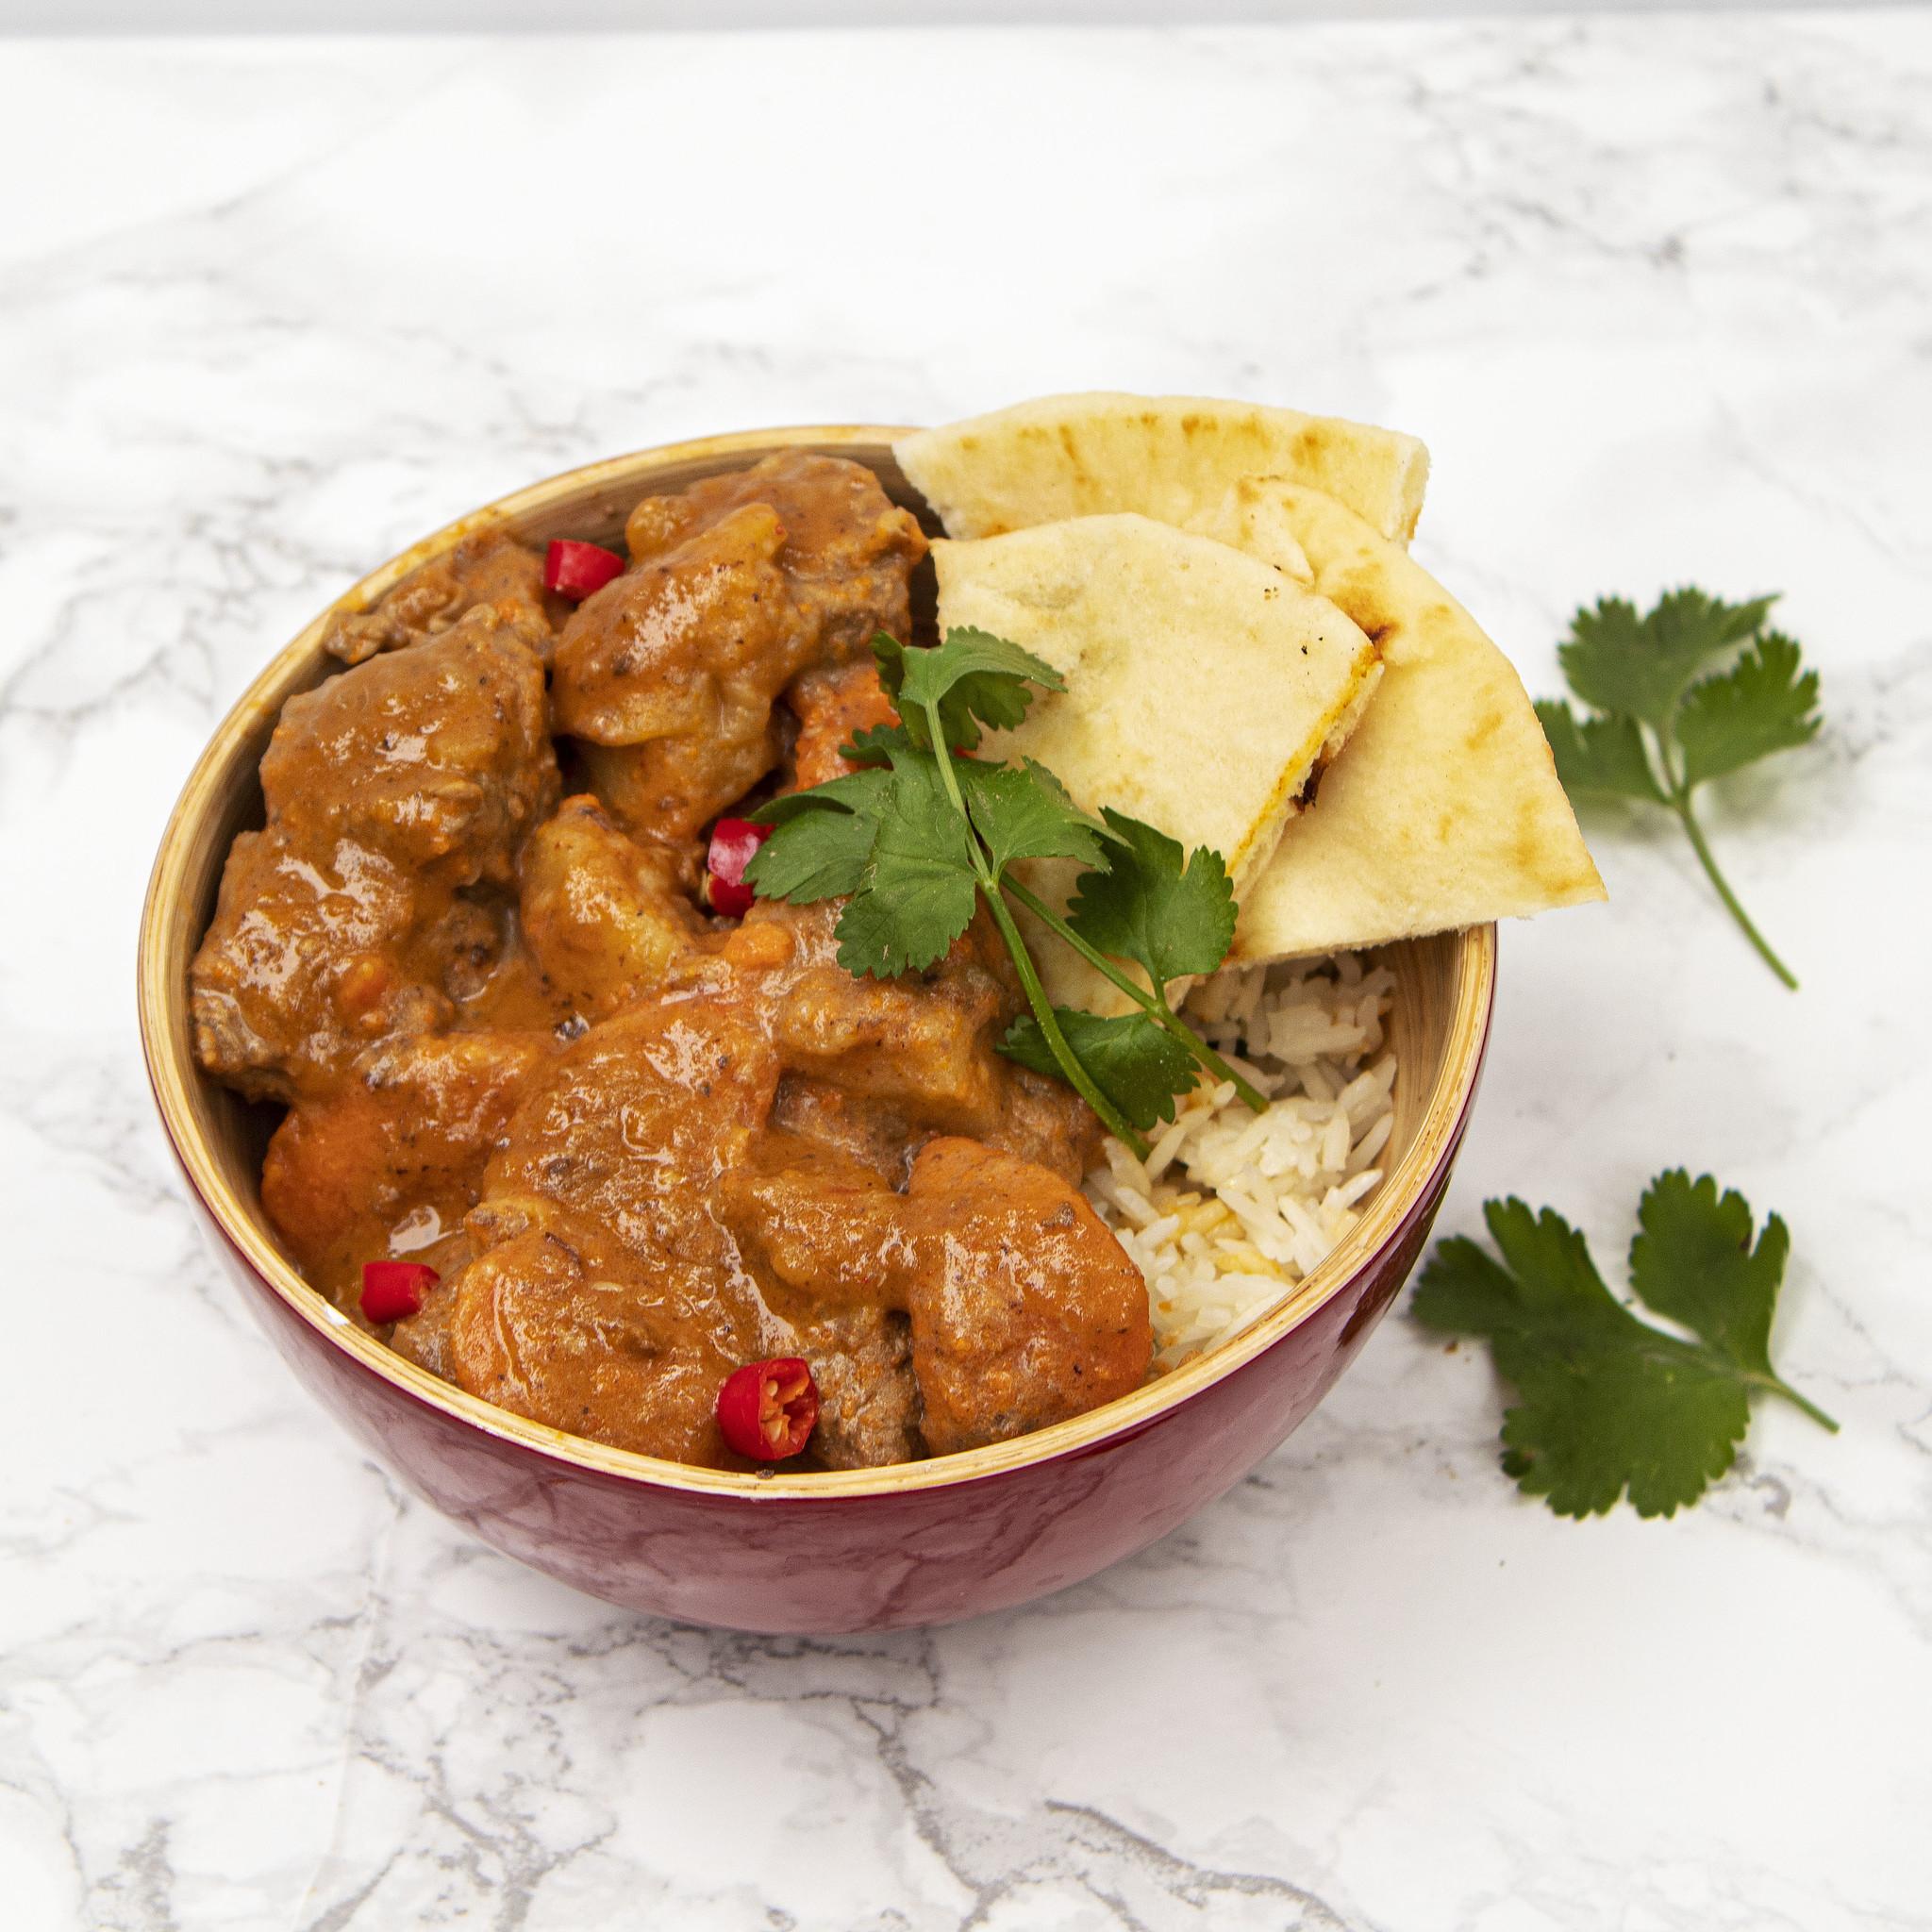 Thai Beef Curry Dinner (Serves 4)